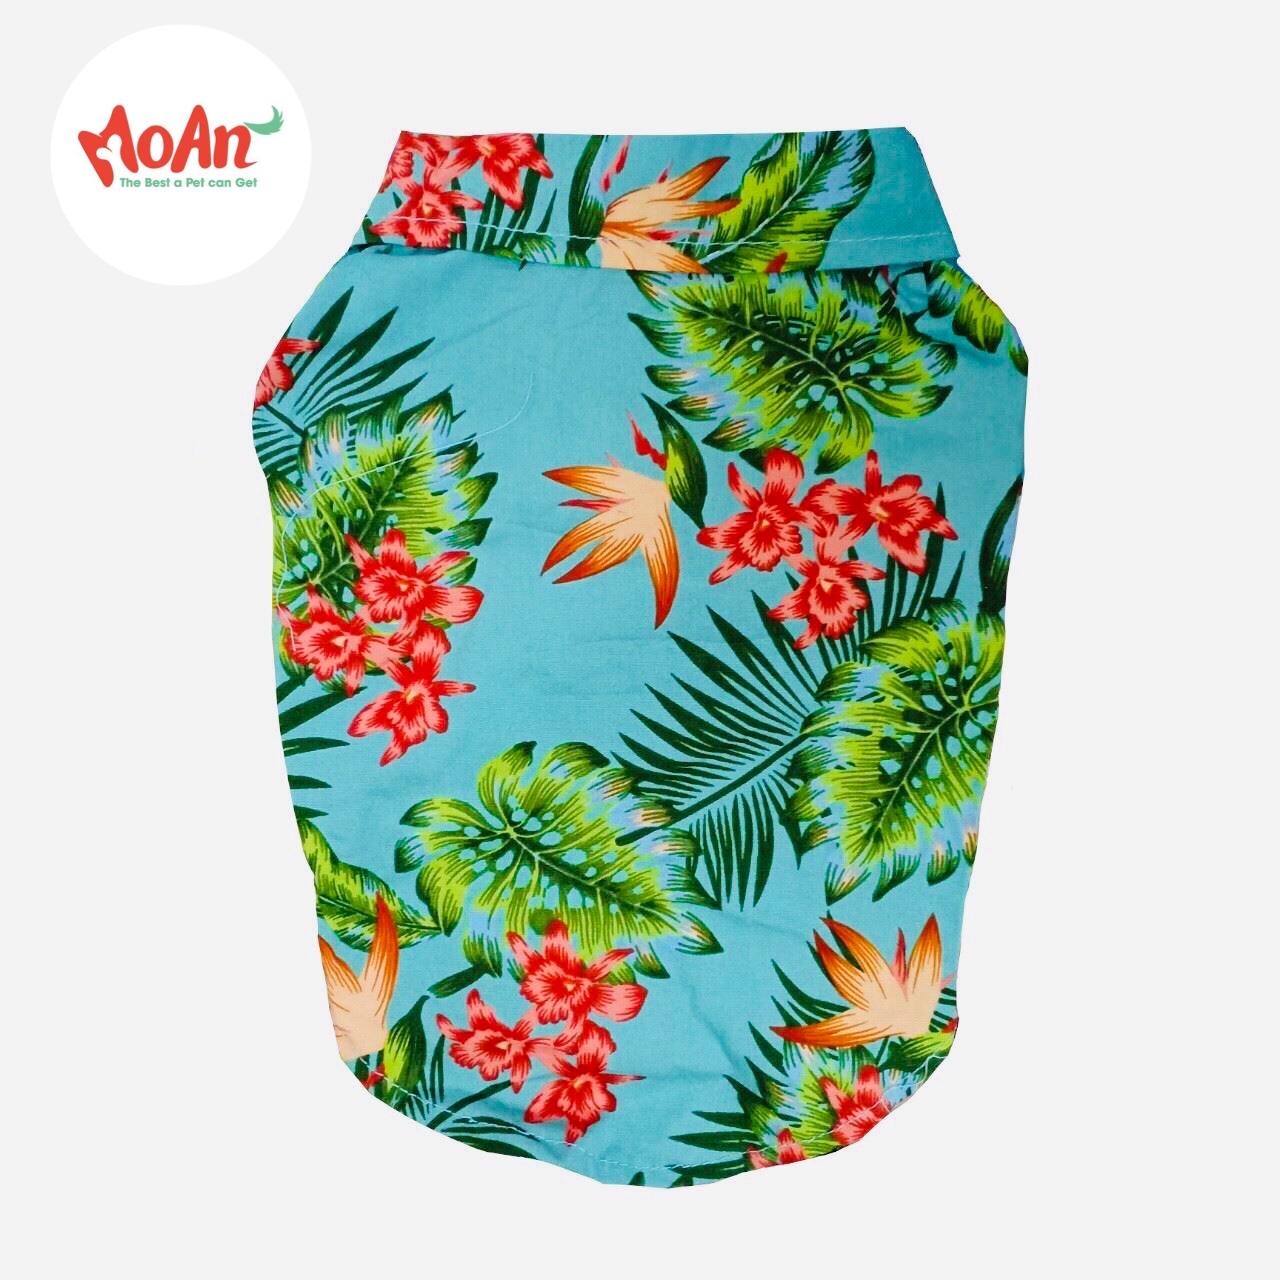 Áo Sơ Mi Hawaii [Size 2 - Size 11] 2kg - 35kg